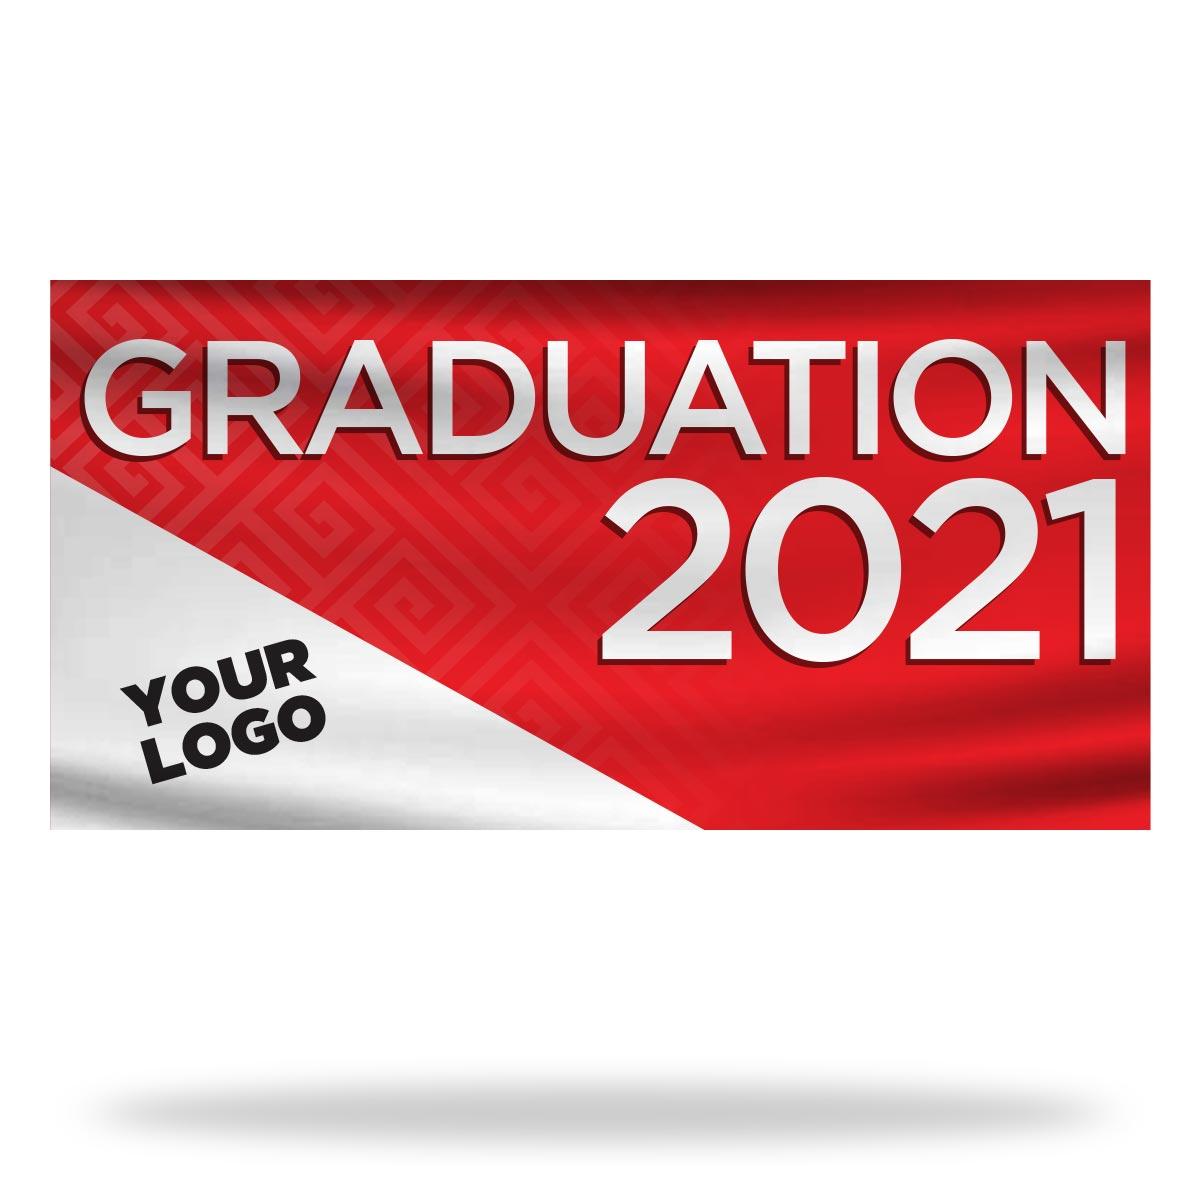 Graduation Flags & Banners Design 03